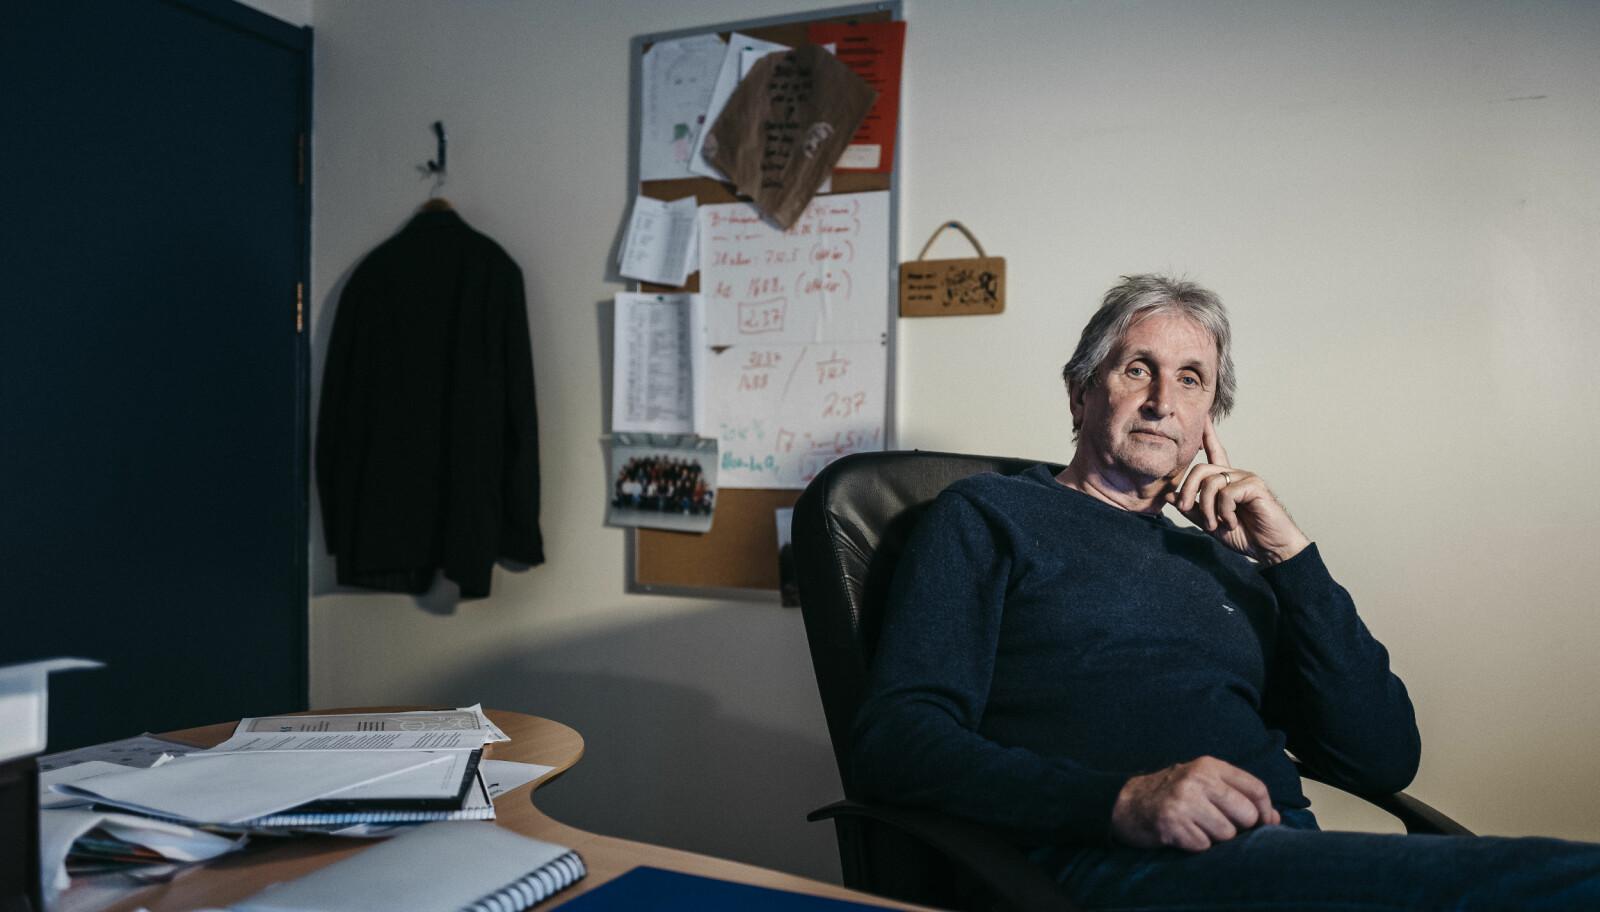 Johannes Johannessen, rektor ved Frakkagjerd ungdomsskole. FOTO: Tommy Ellingsen